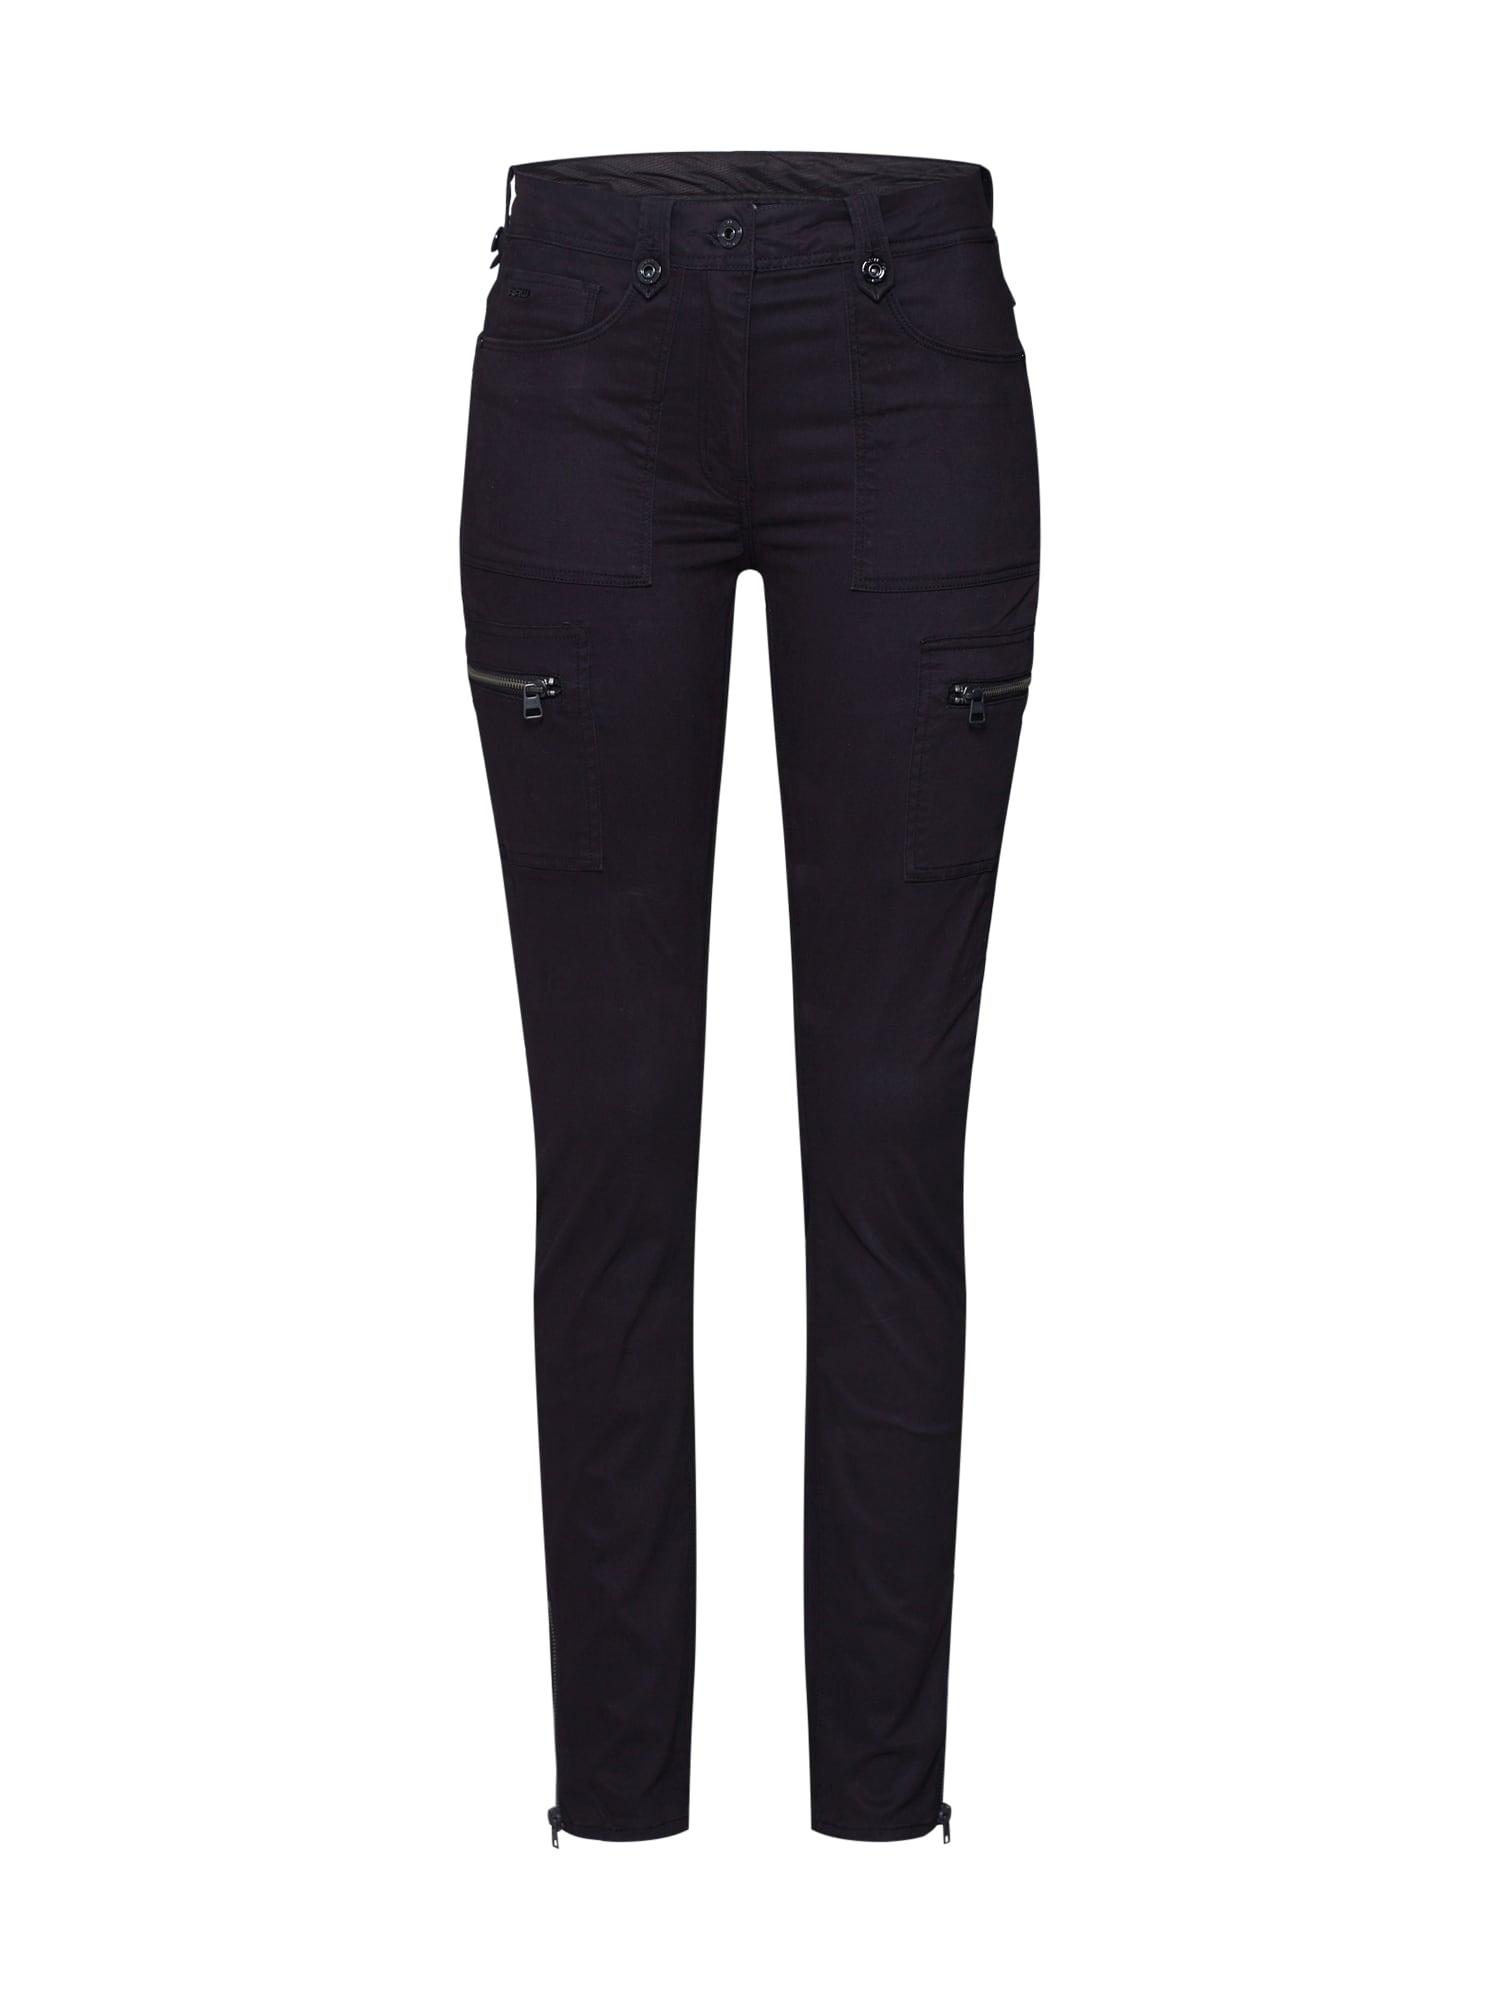 G-Star RAW Laisvo stiliaus kelnės 'Kerf cargo' juoda